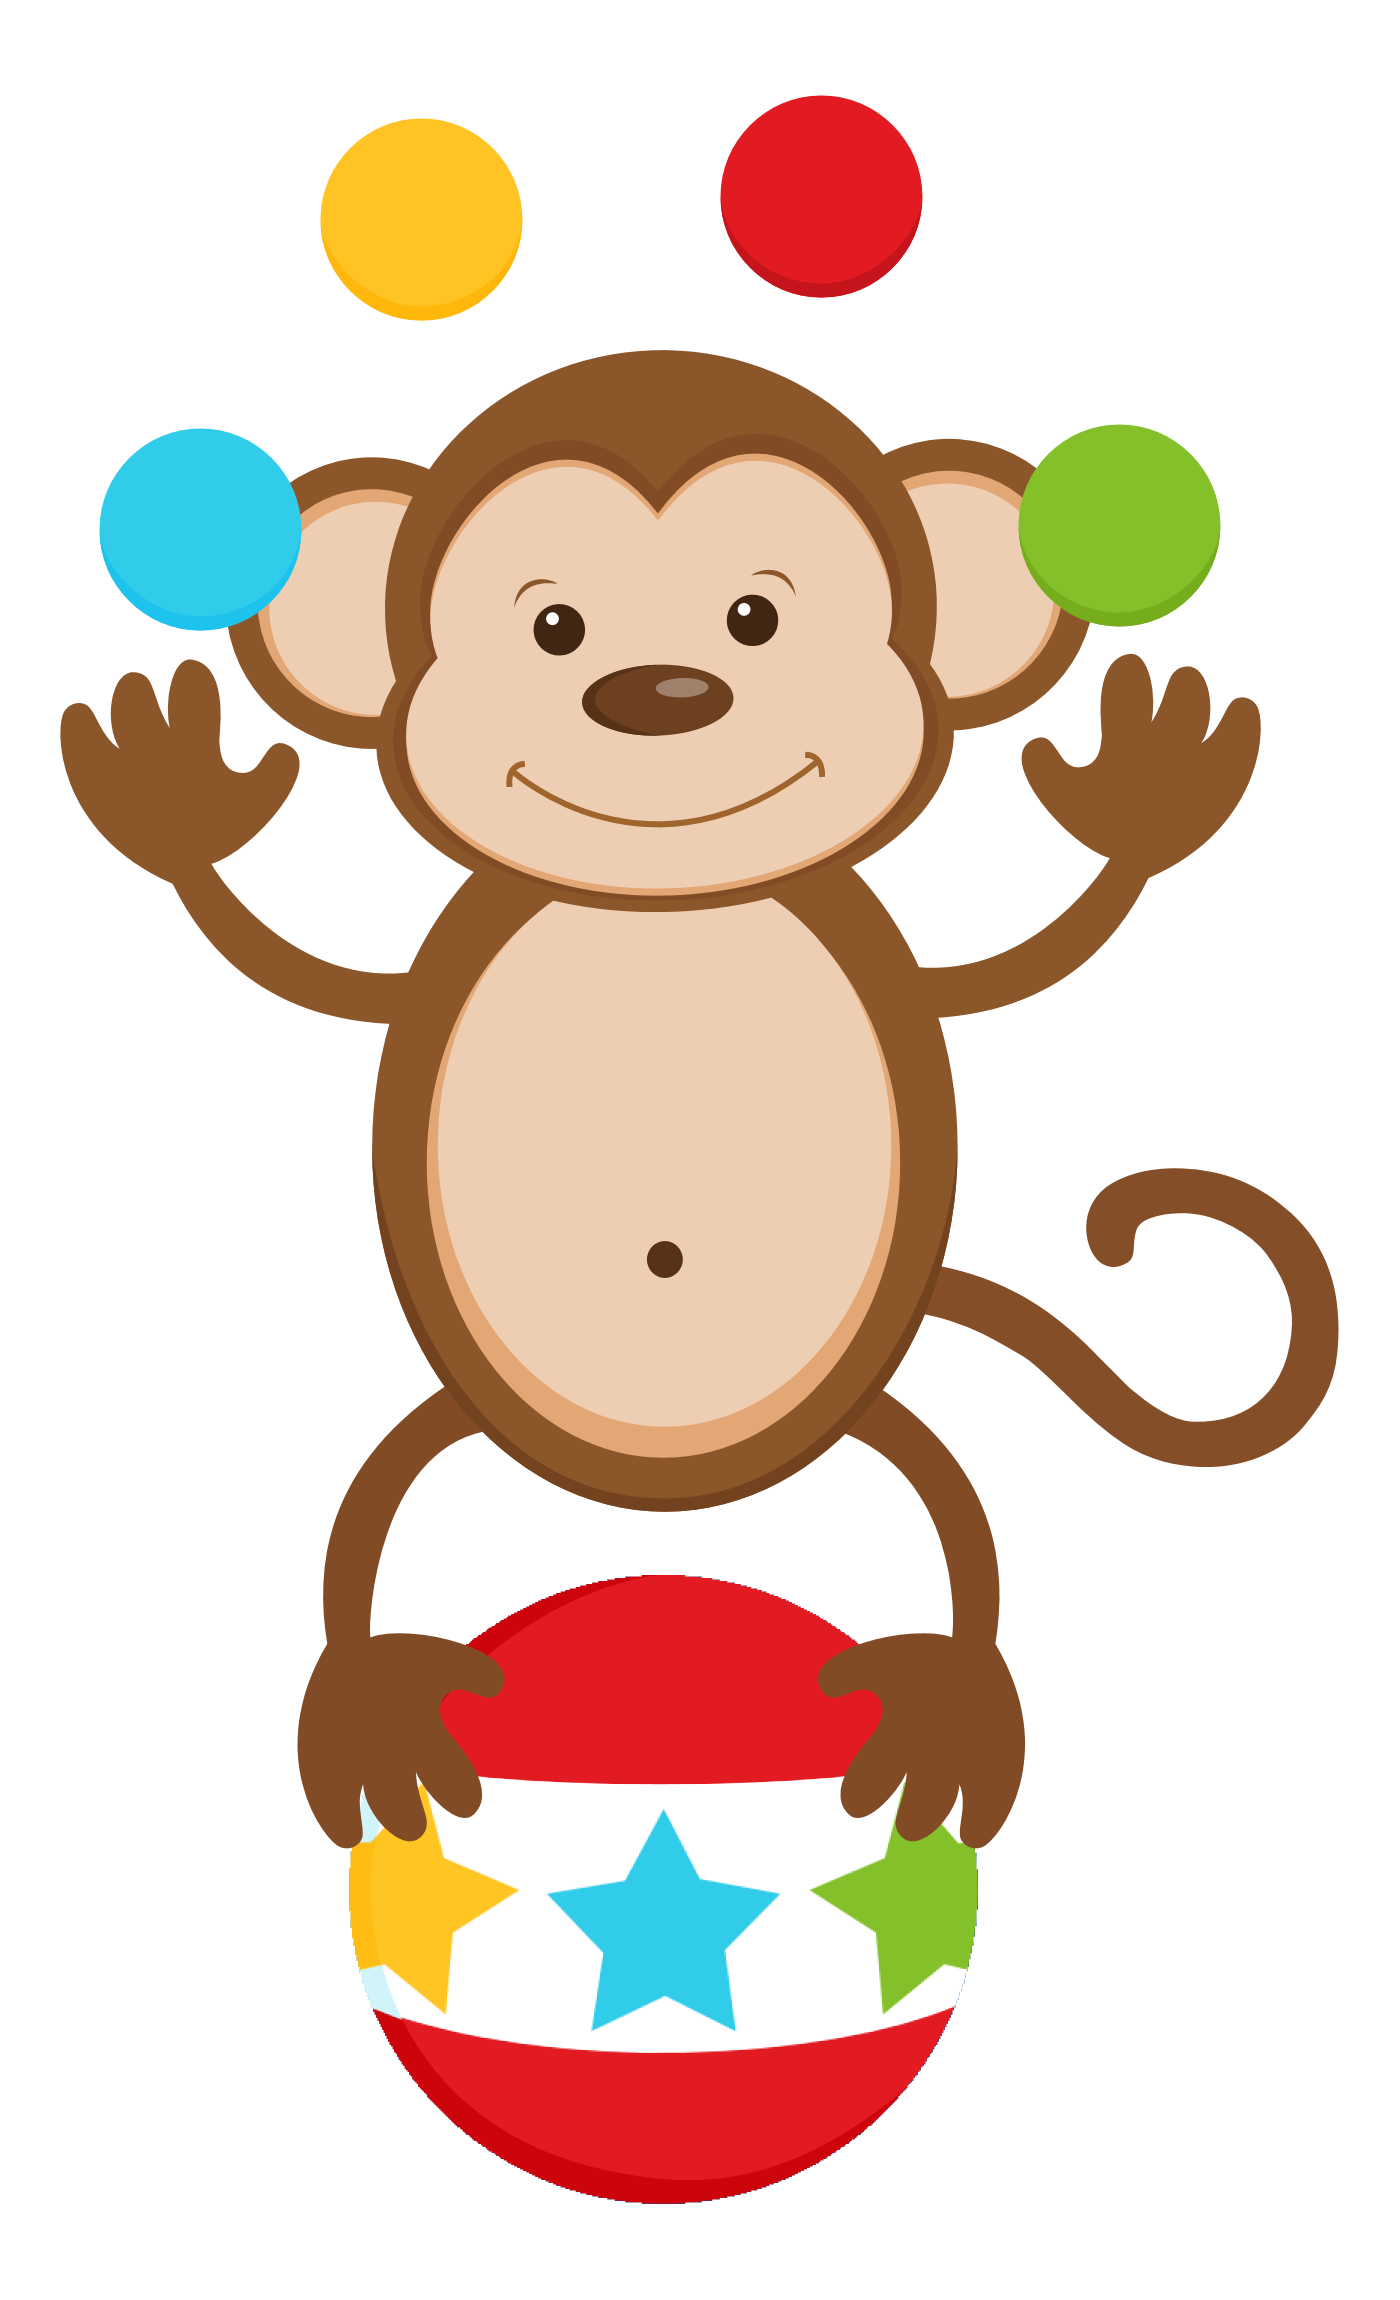 Monkey clipart vintage, Monkey vintage Transparent FREE for.